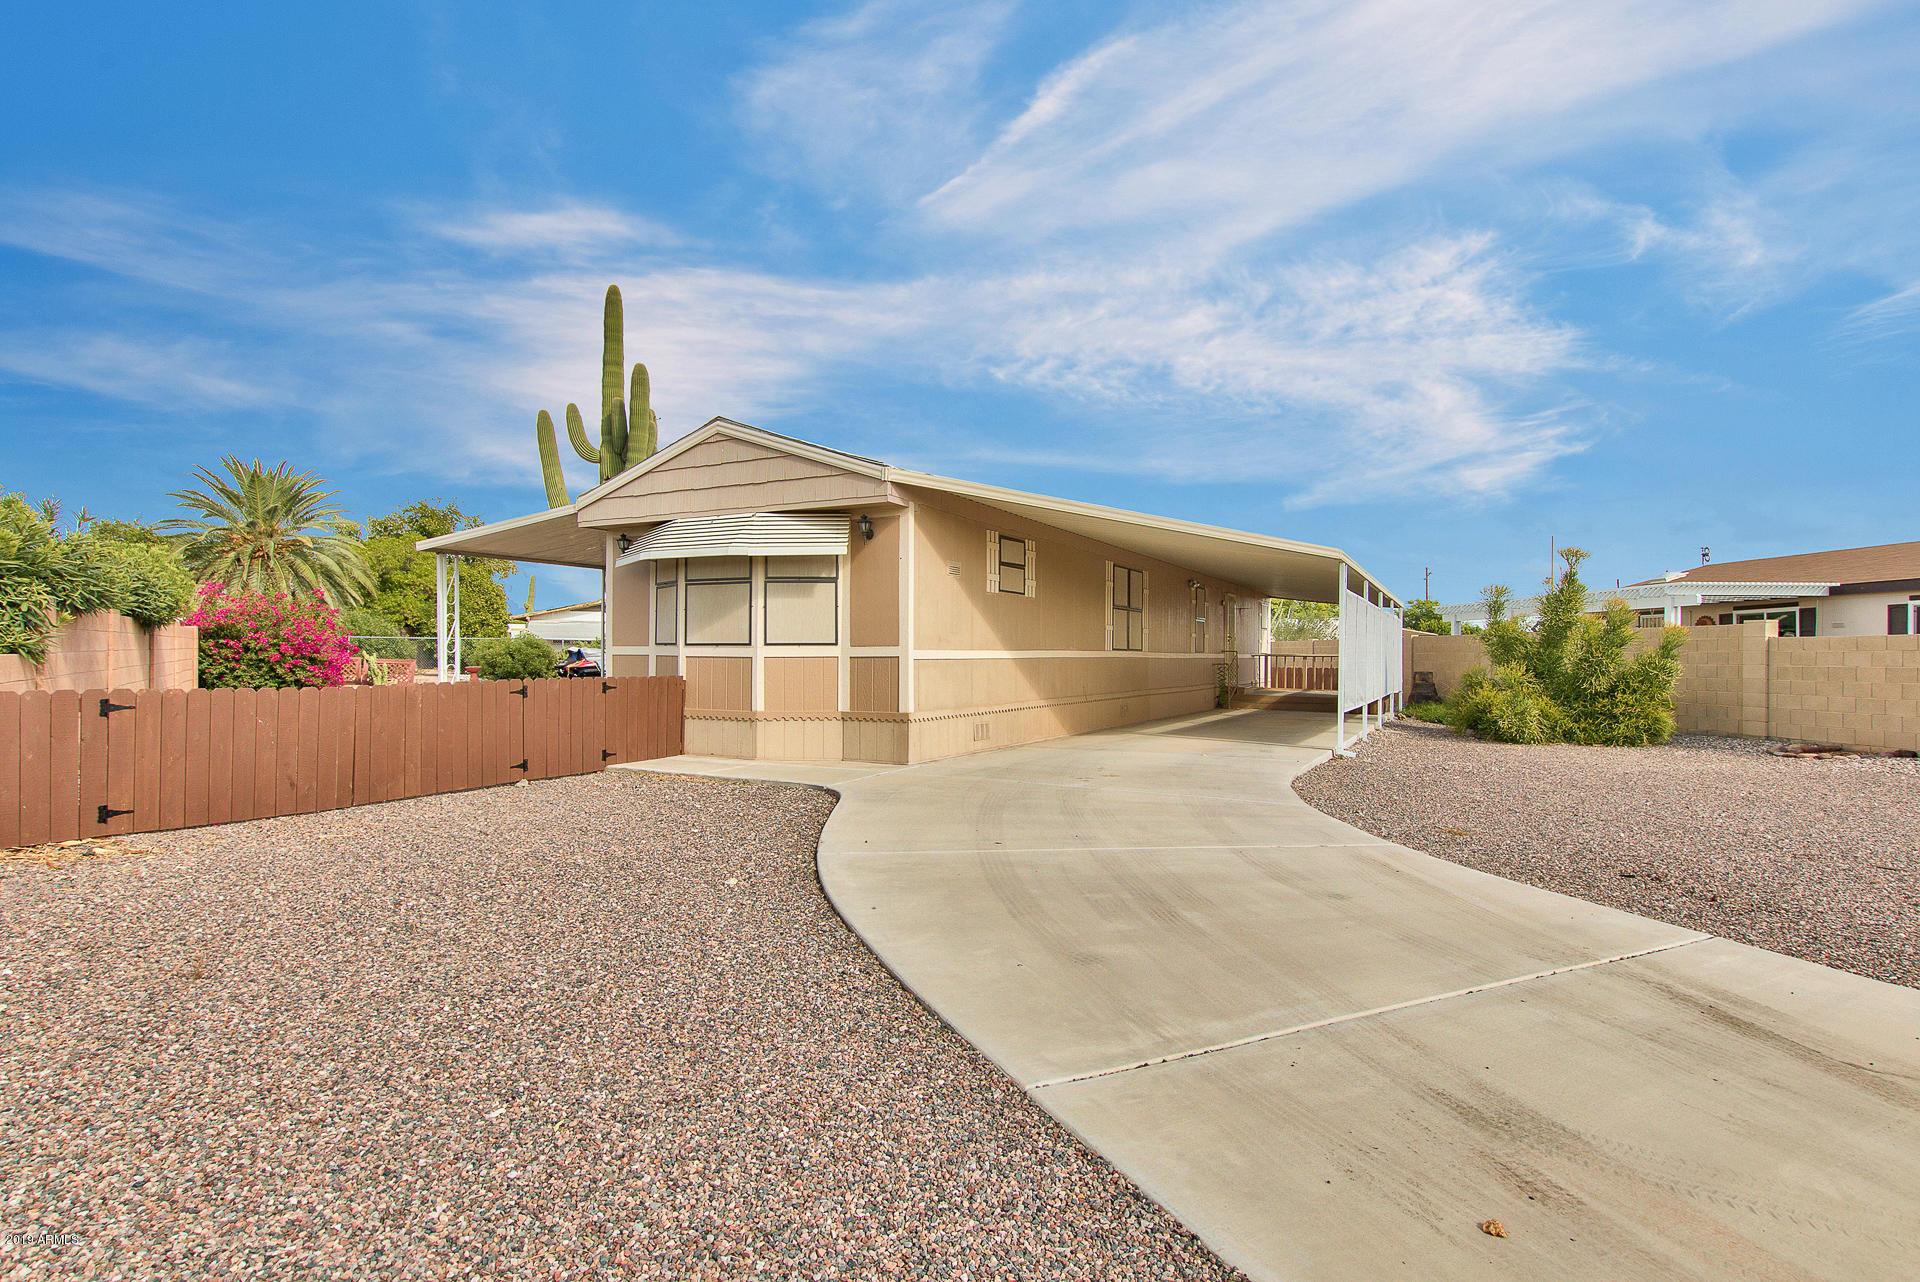 Photo of 745 S 87TH Street, Mesa, AZ 85208